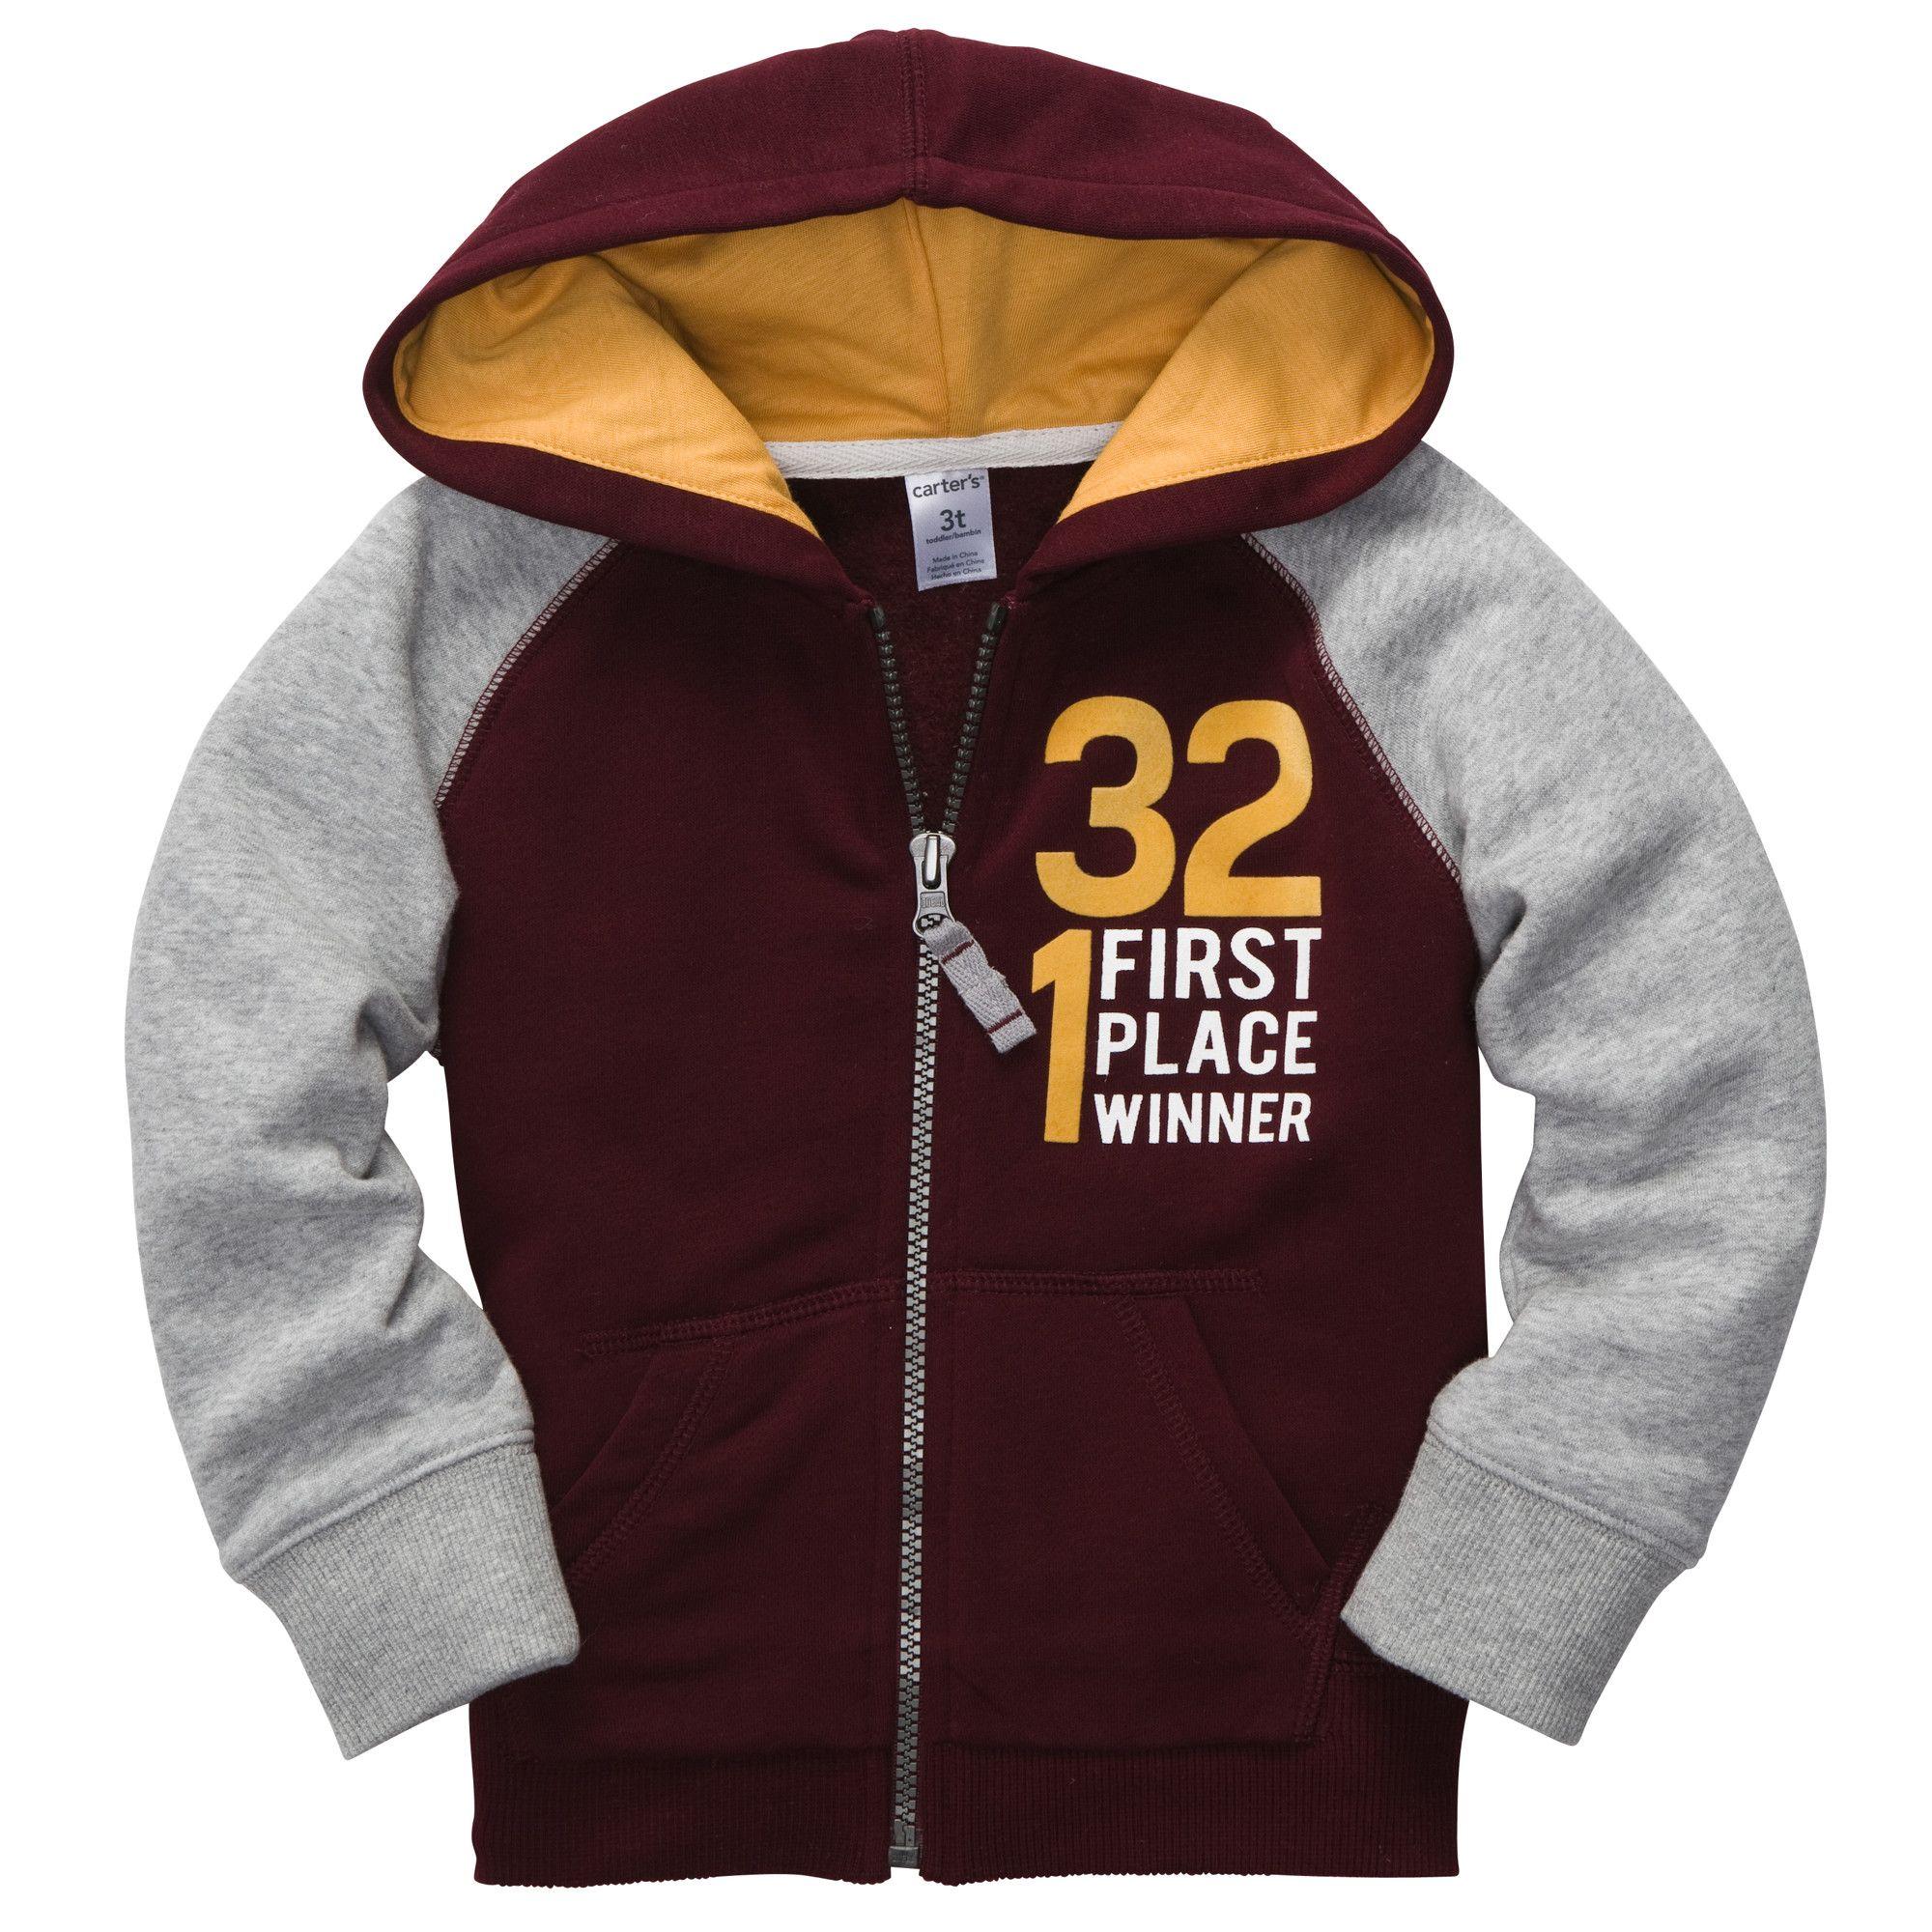 Fleece Athletic Hoodie Baby Boy Jackets Outerwear Baby Boy Jackets Hoodies Junior Girls Clothing [ 2000 x 2000 Pixel ]